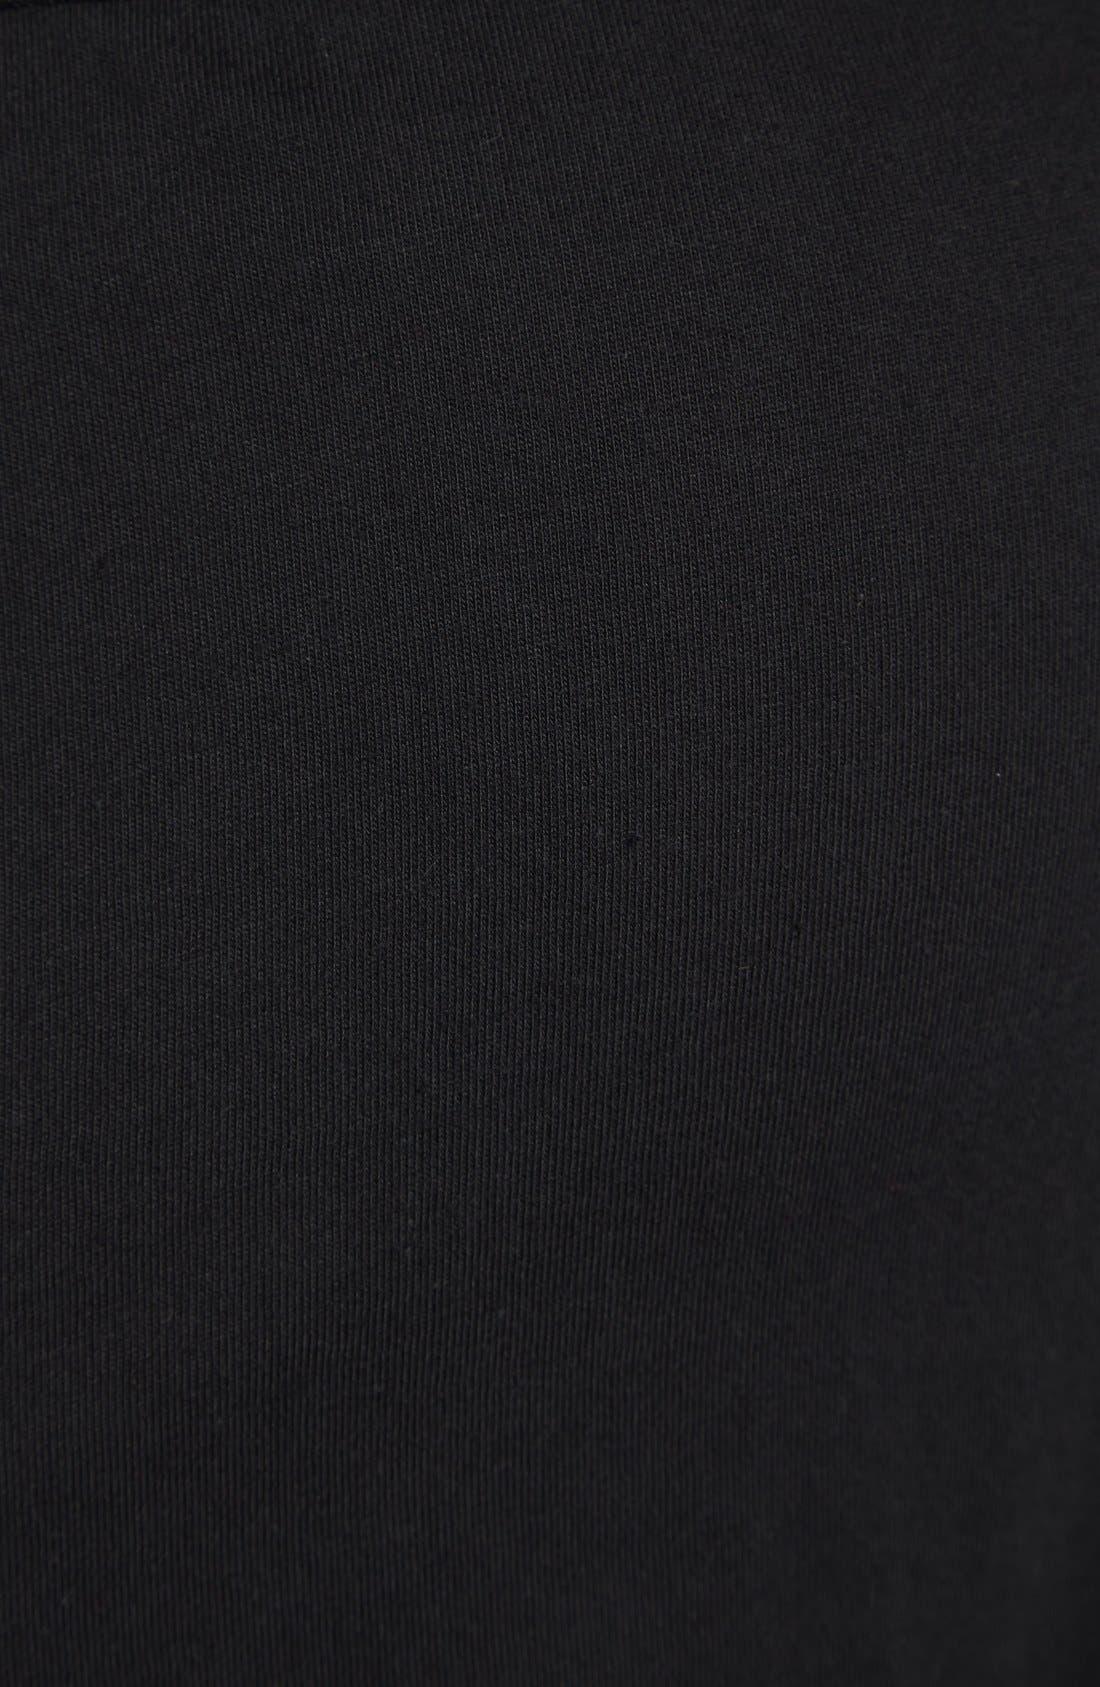 Alternate Image 3  - Calvin Klein 3-Pack Cotton Boxers